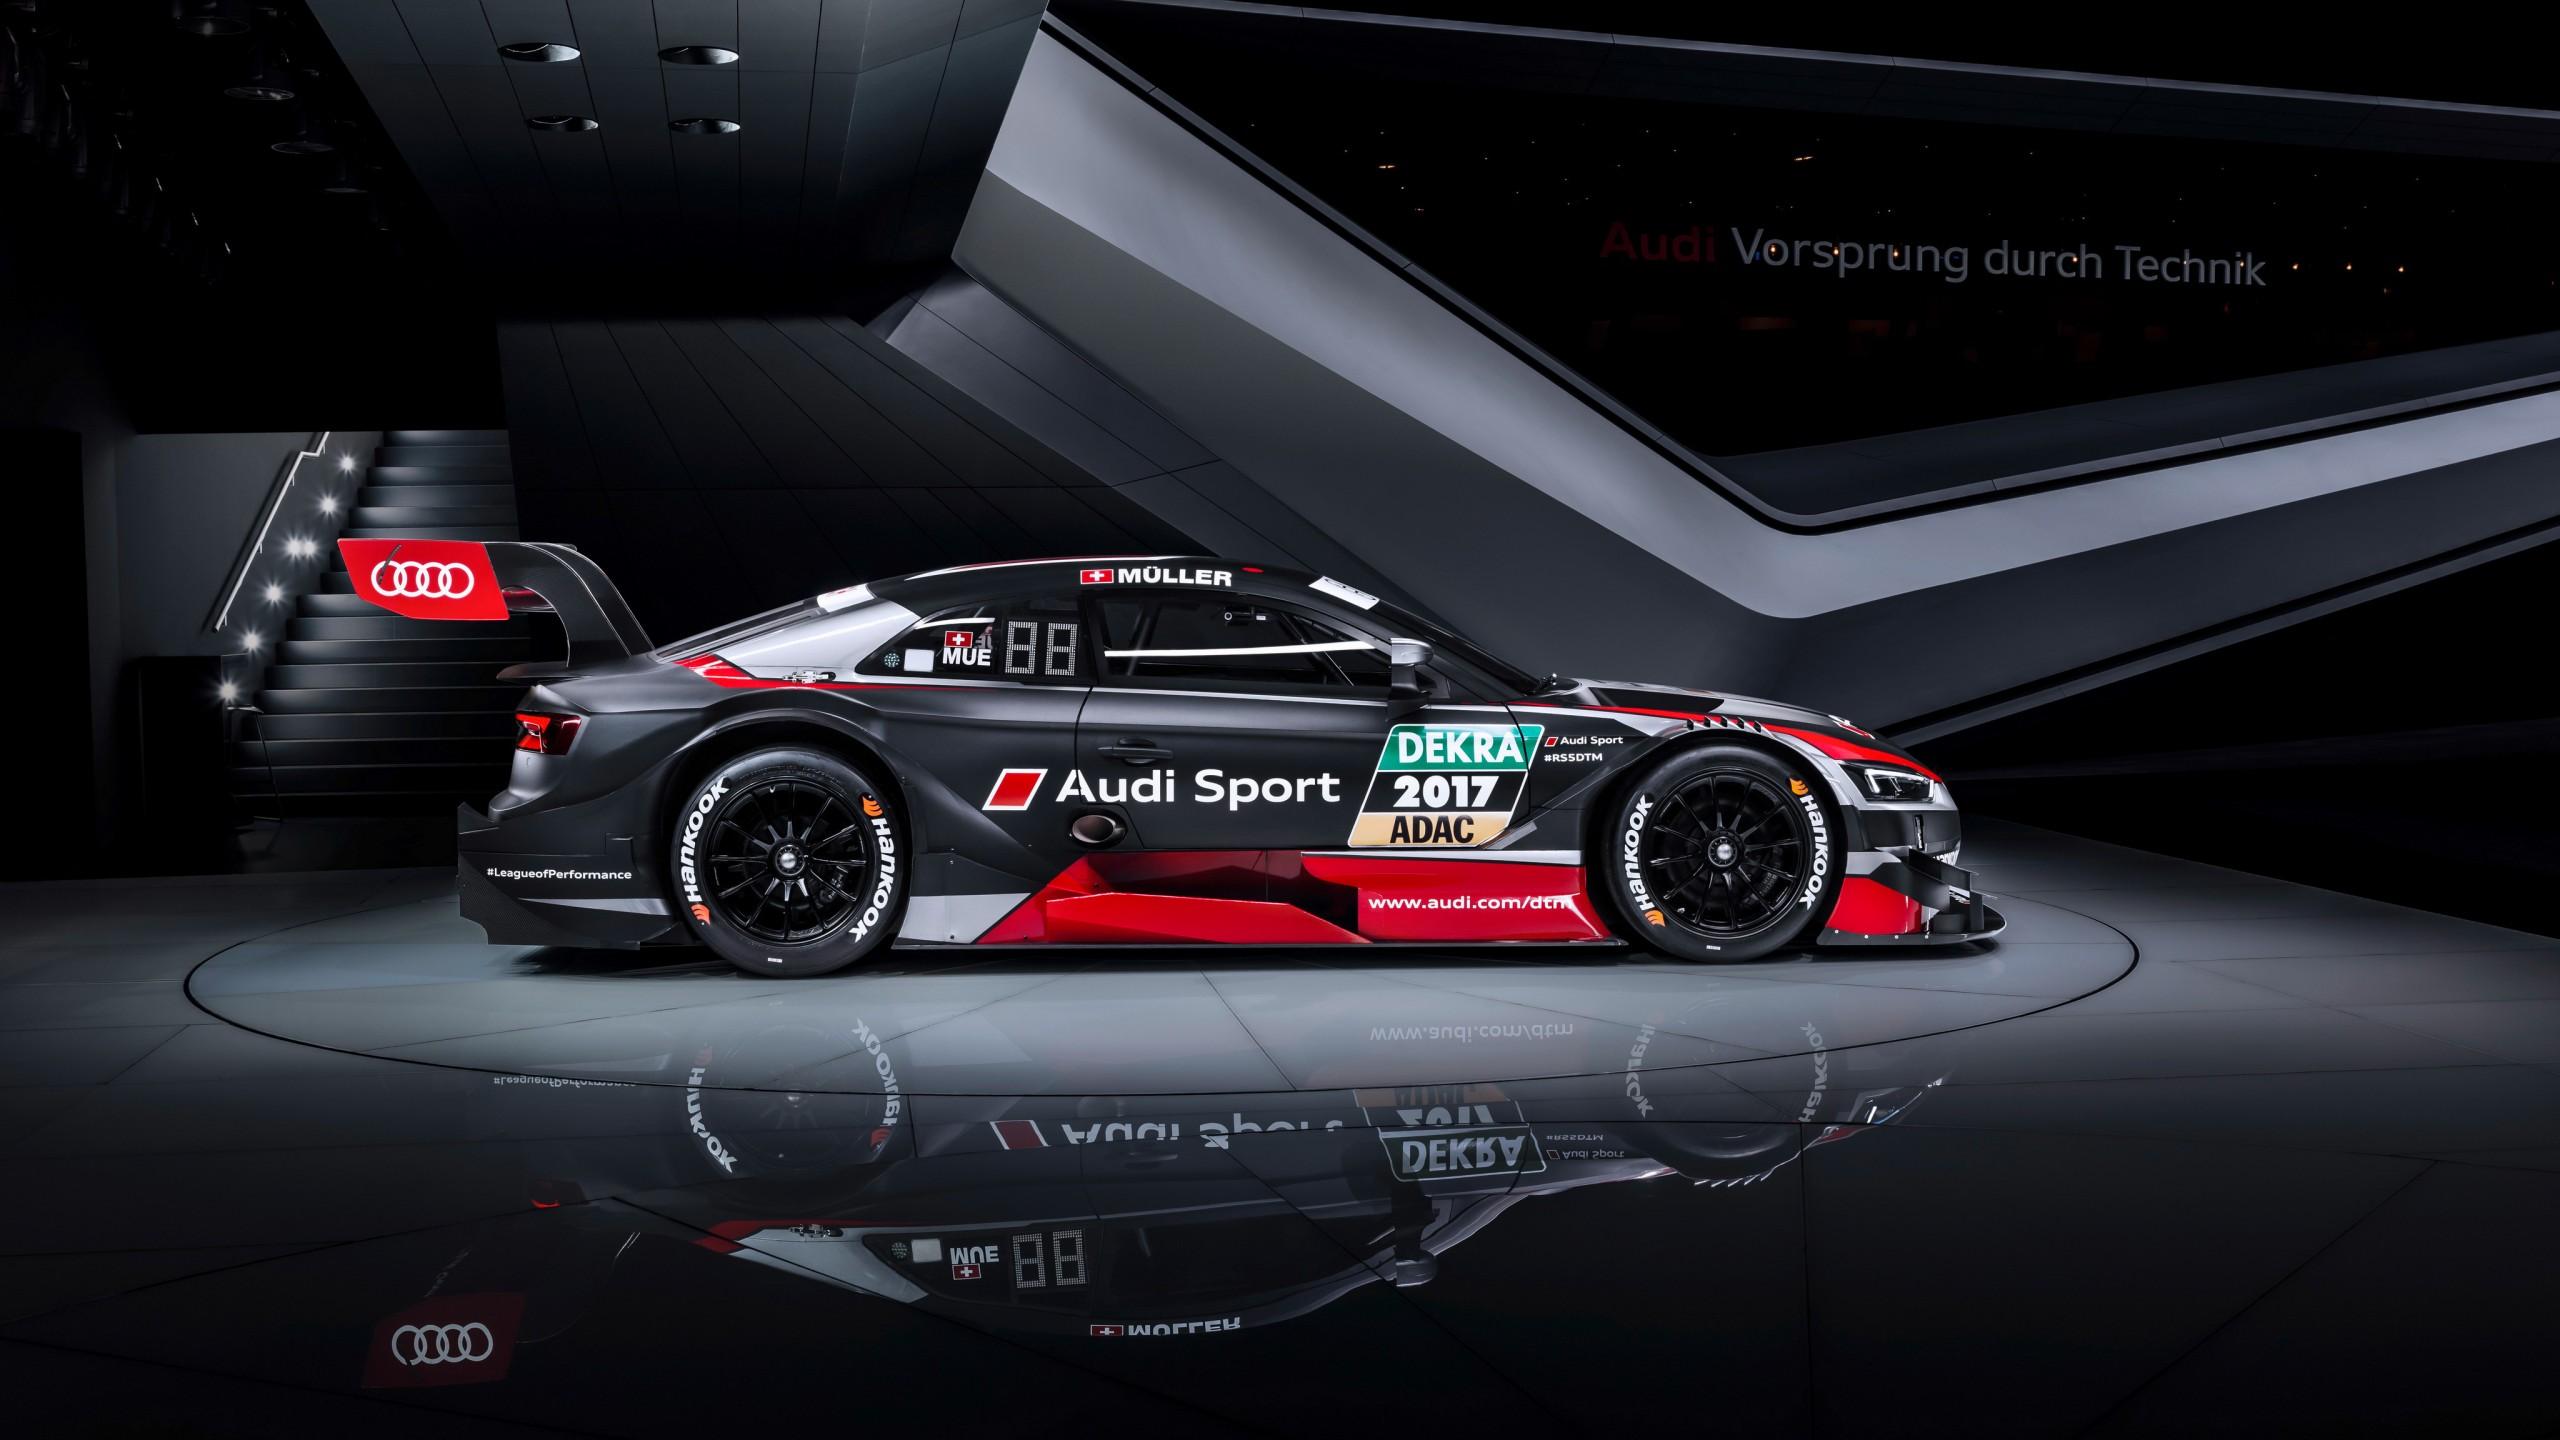 2018 Best Car Wallpapers: 2018 Audi RS 5 Coupe DTM 4K Wallpaper